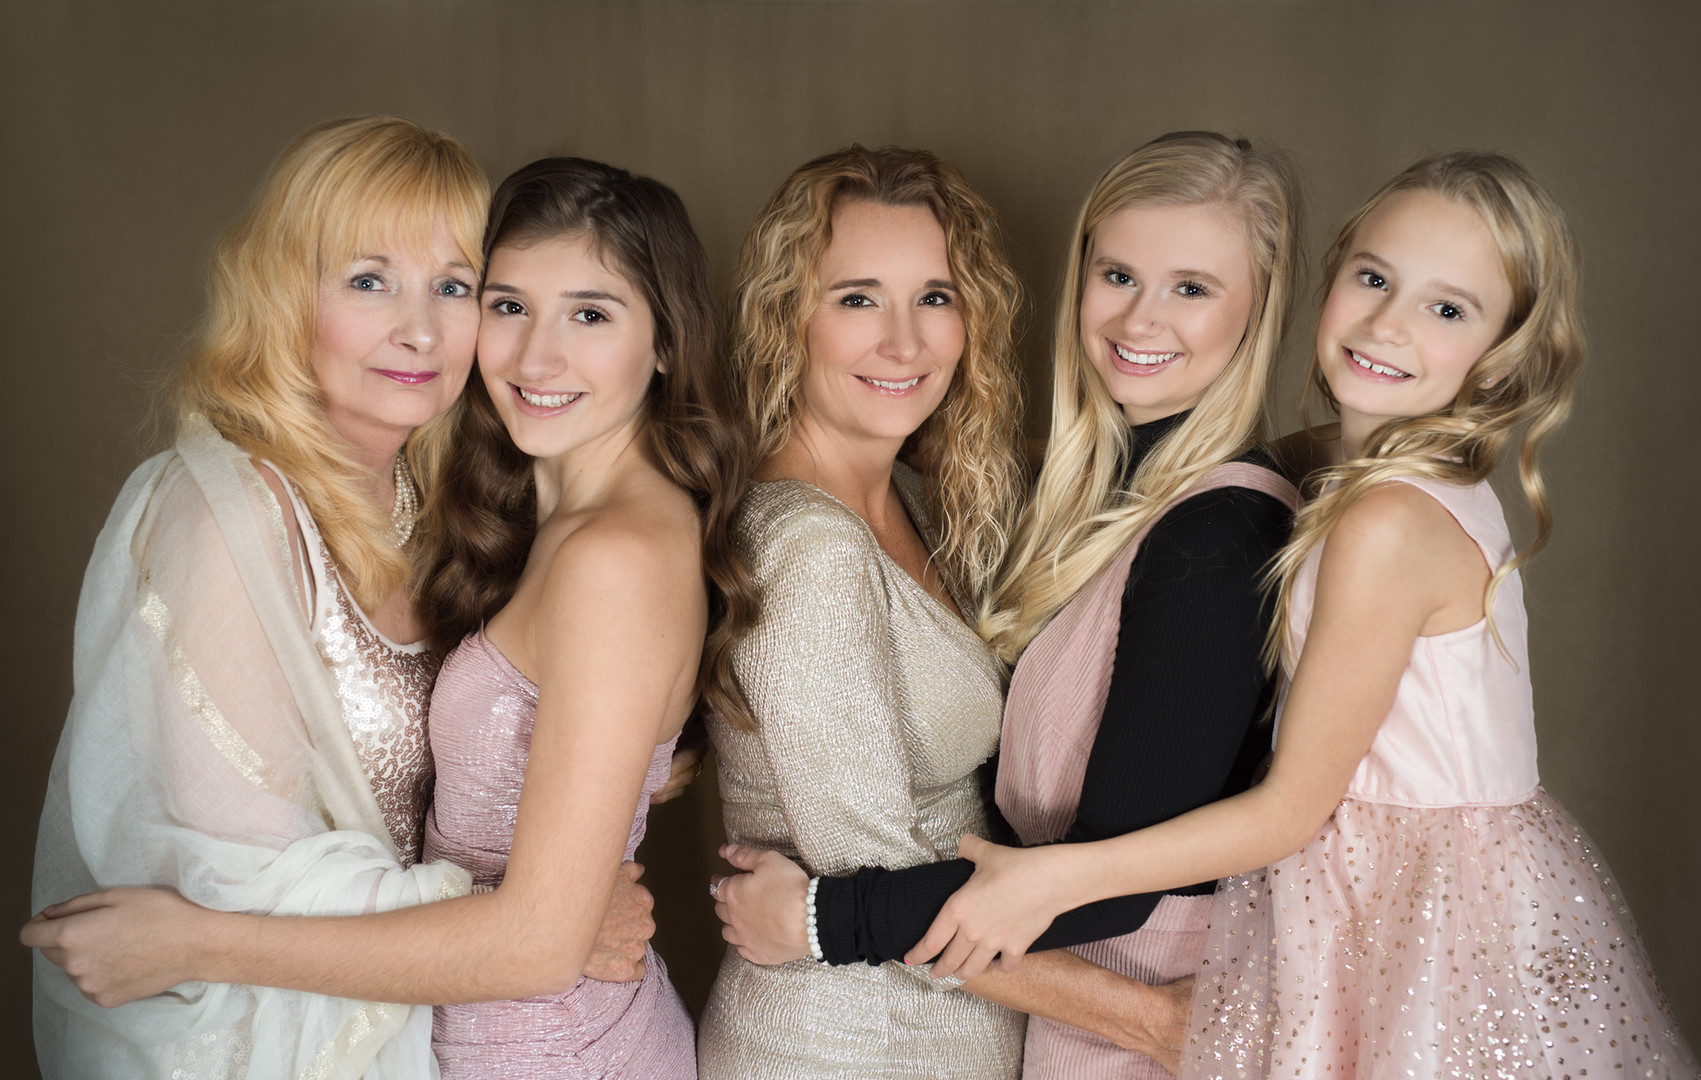 Family Generation of Women